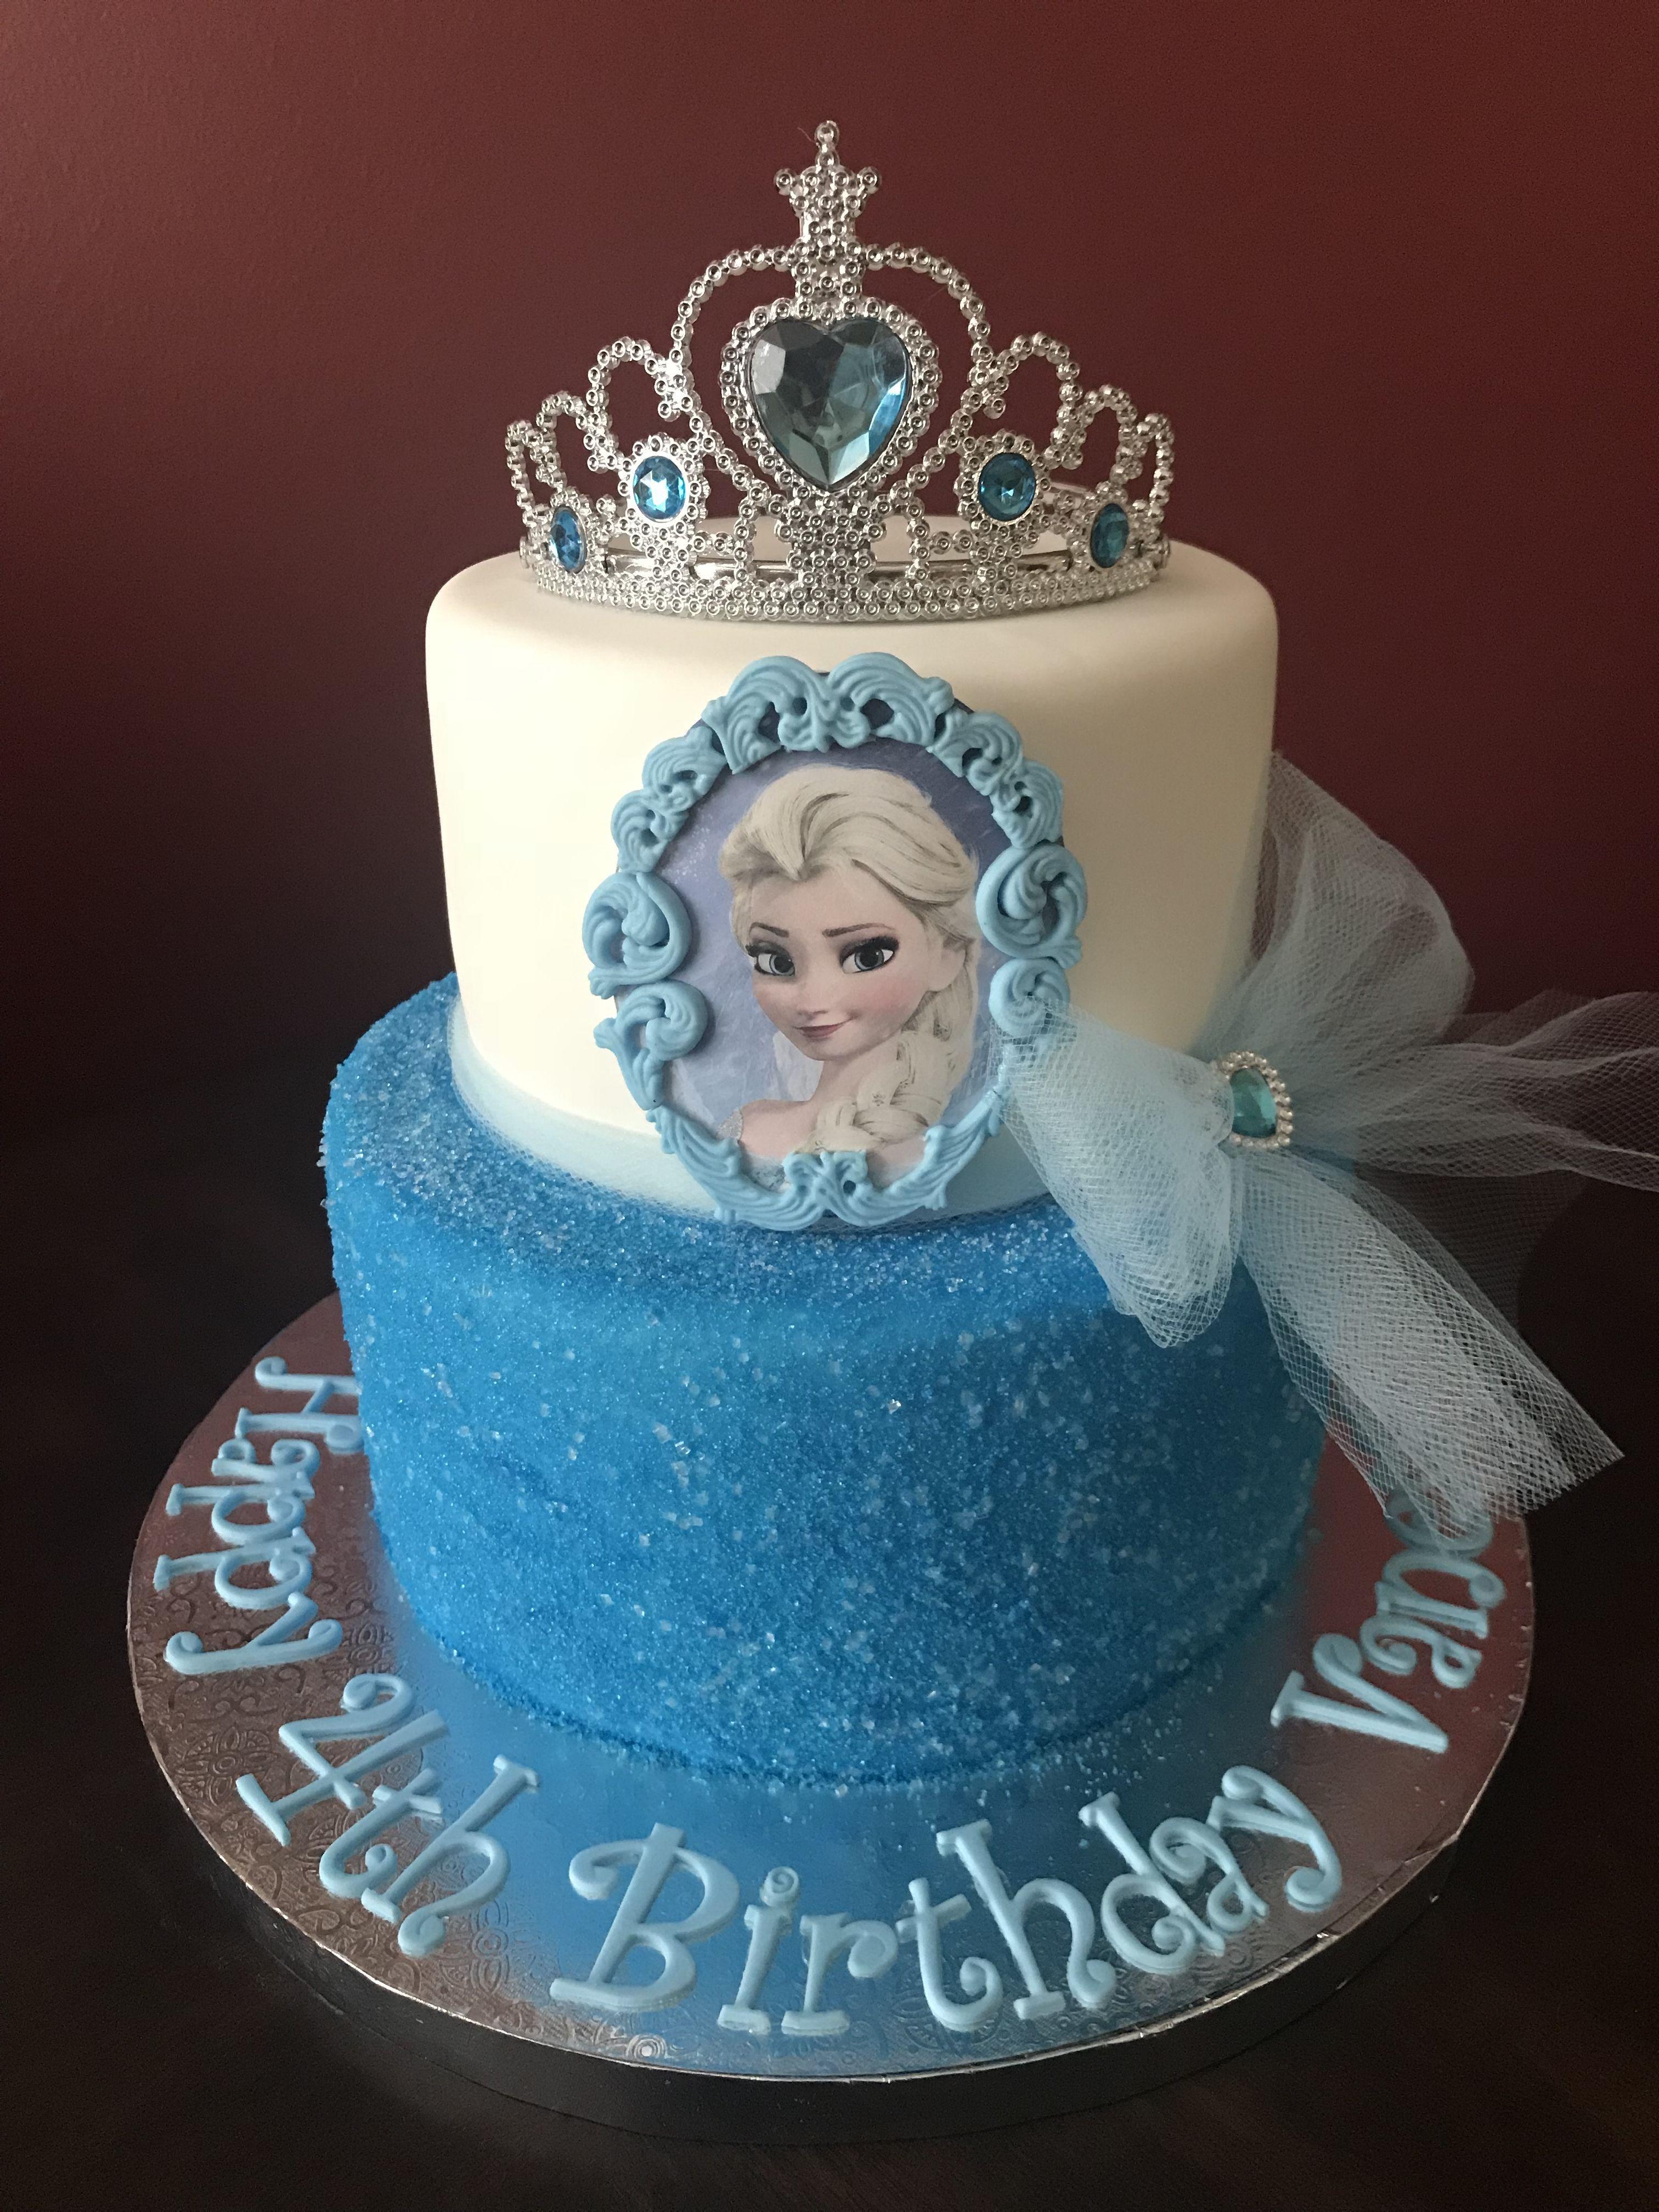 Awe Inspiring Elsa Birthday Cakes Barbie Birthday Cakes Wwwibirthdaycakebarbie Funny Birthday Cards Online Alyptdamsfinfo